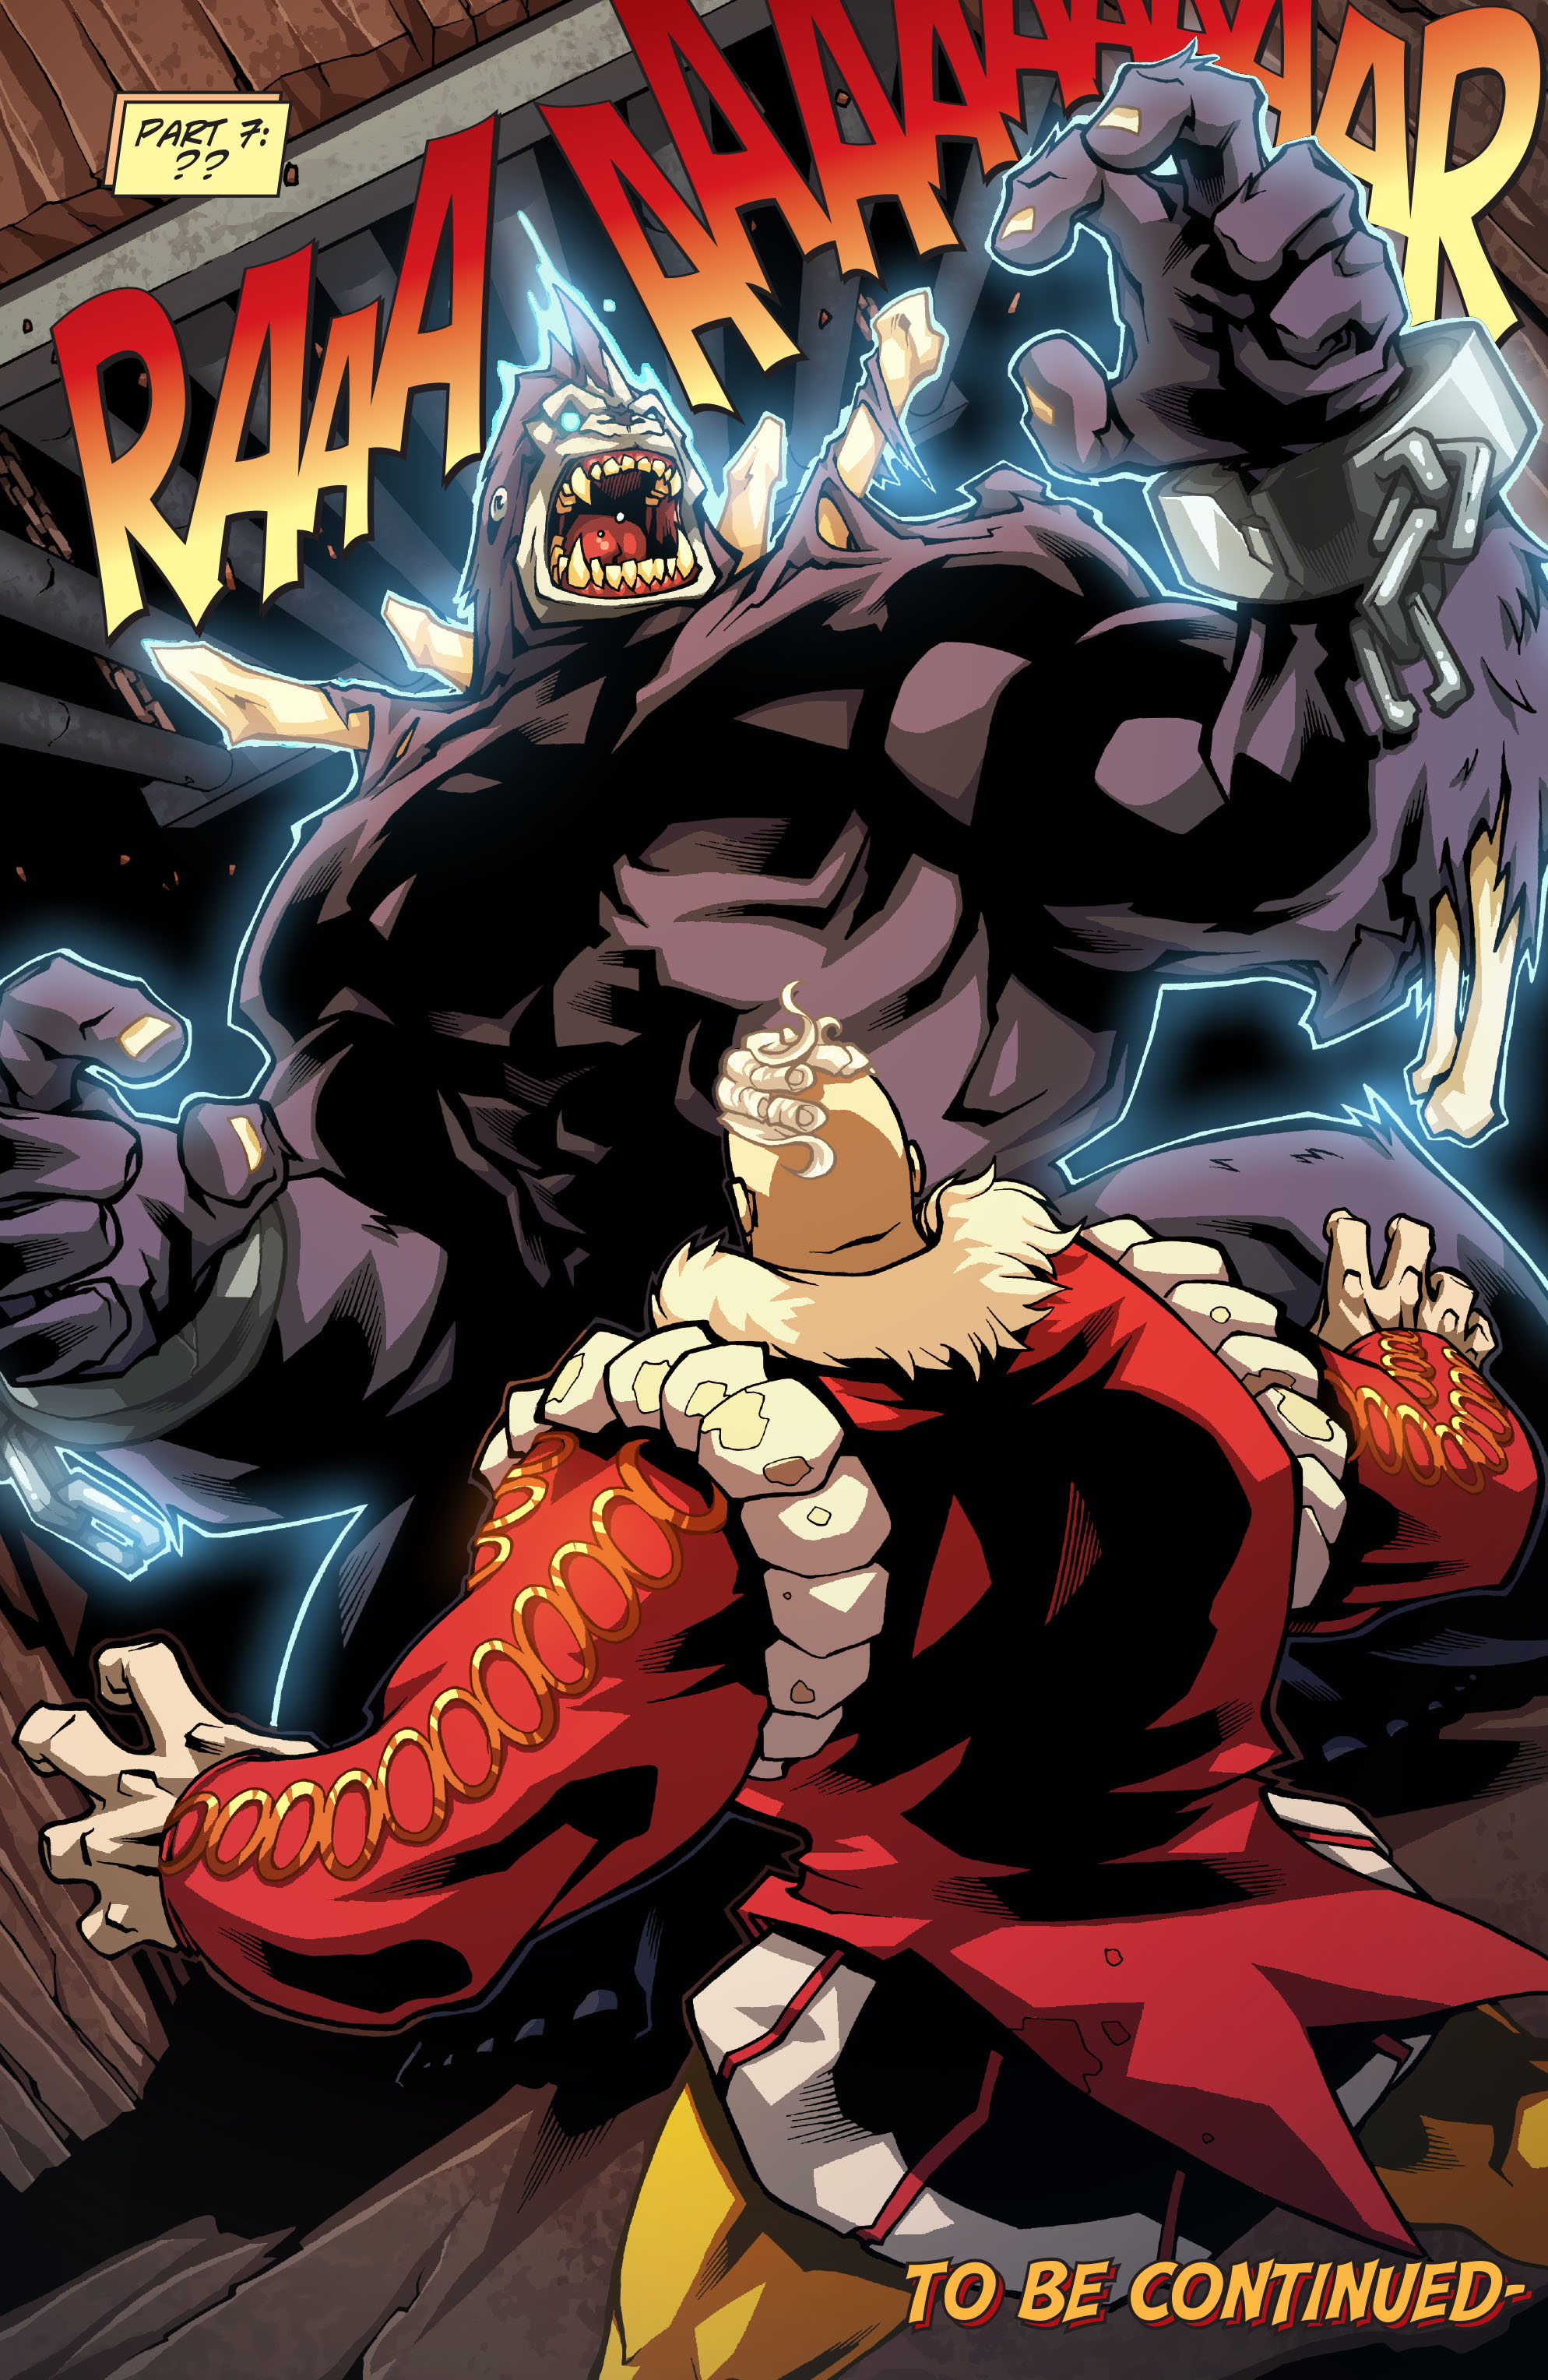 Read online Skullkickers comic -  Issue #8 - 22